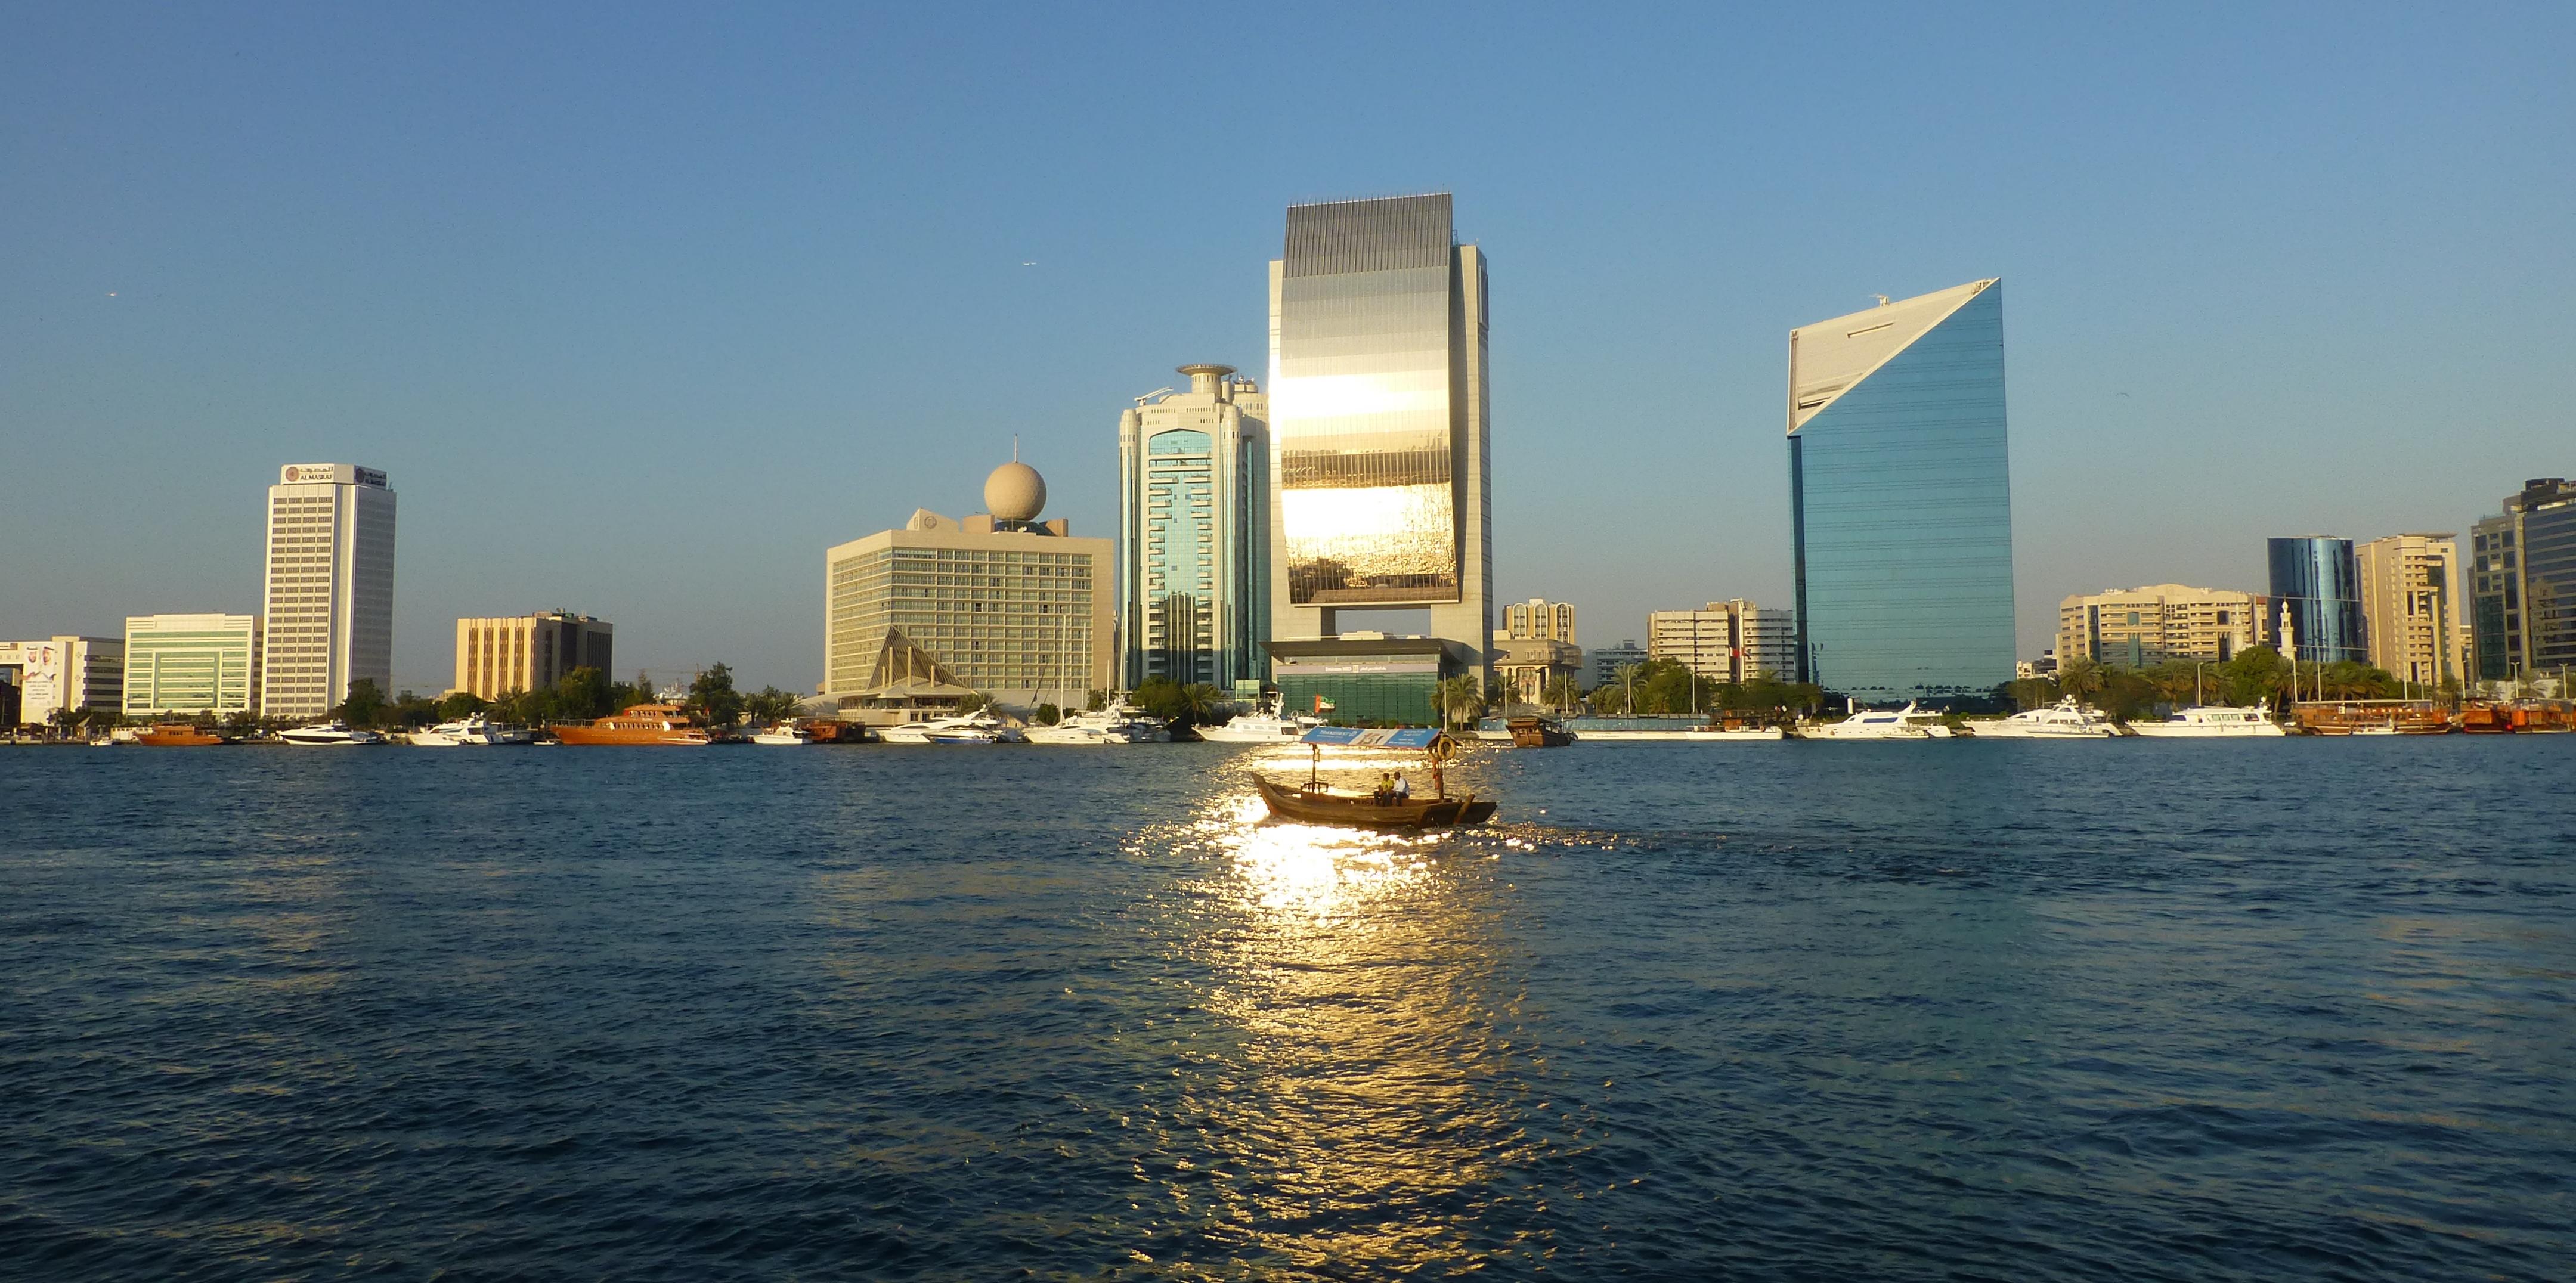 National Bank of Dubai (building) - Wikipedia